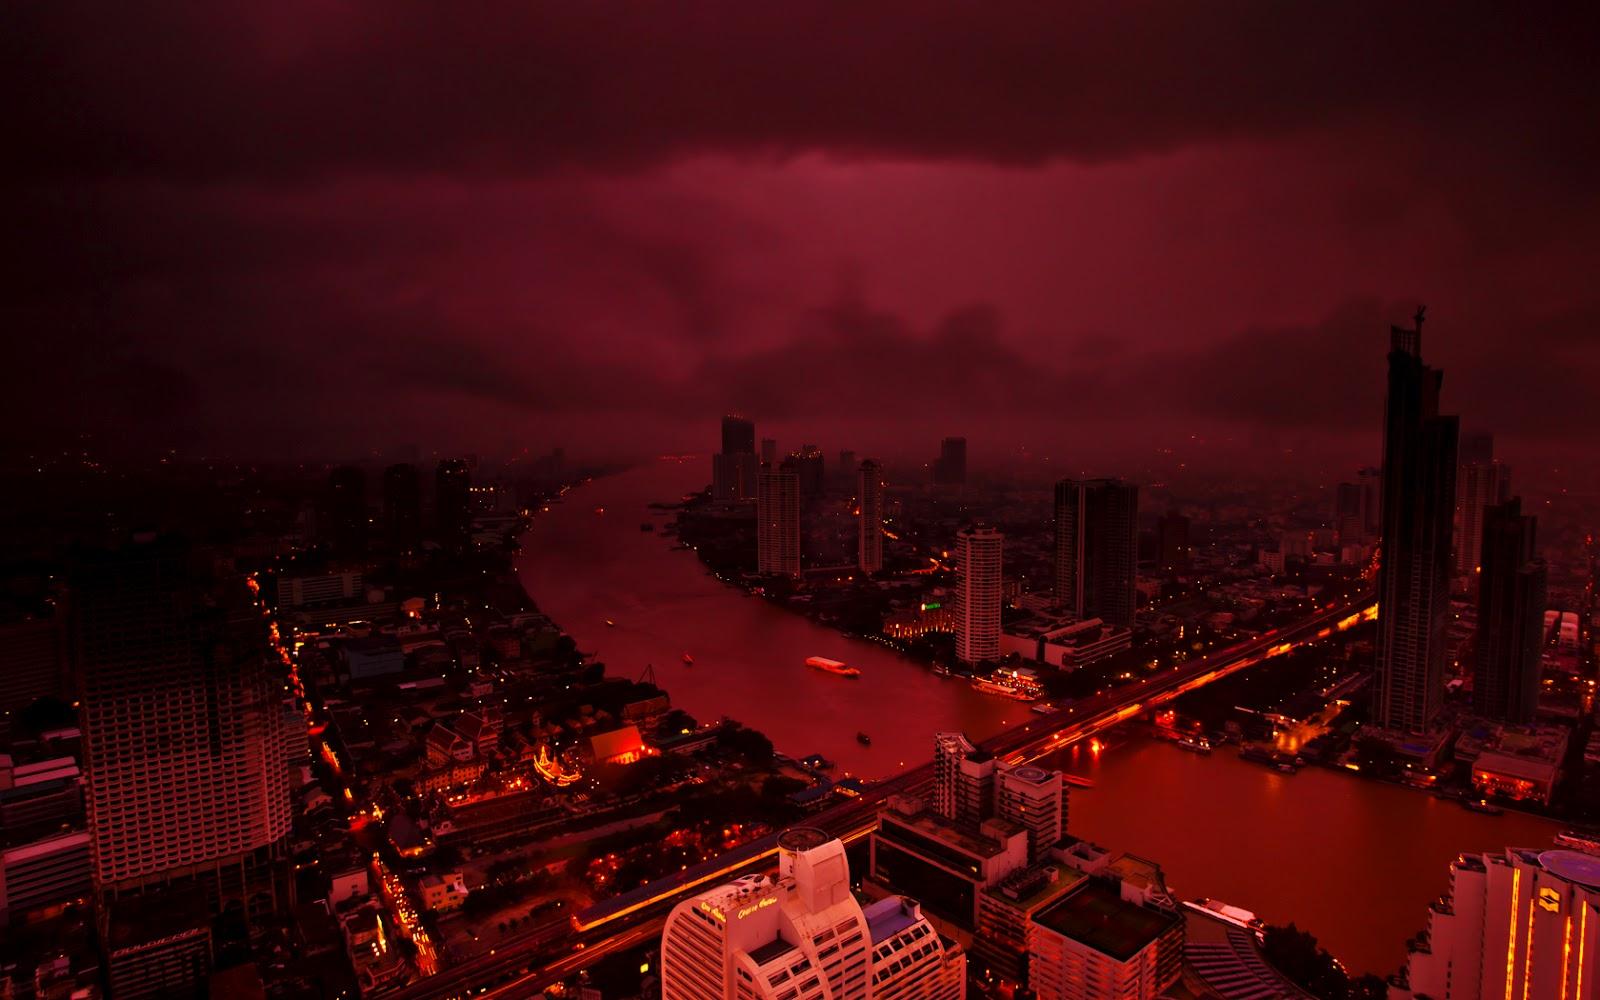 Bangkok Cityscapes Photograpy HD Wallpapers HD Wallpapers 1600x1000